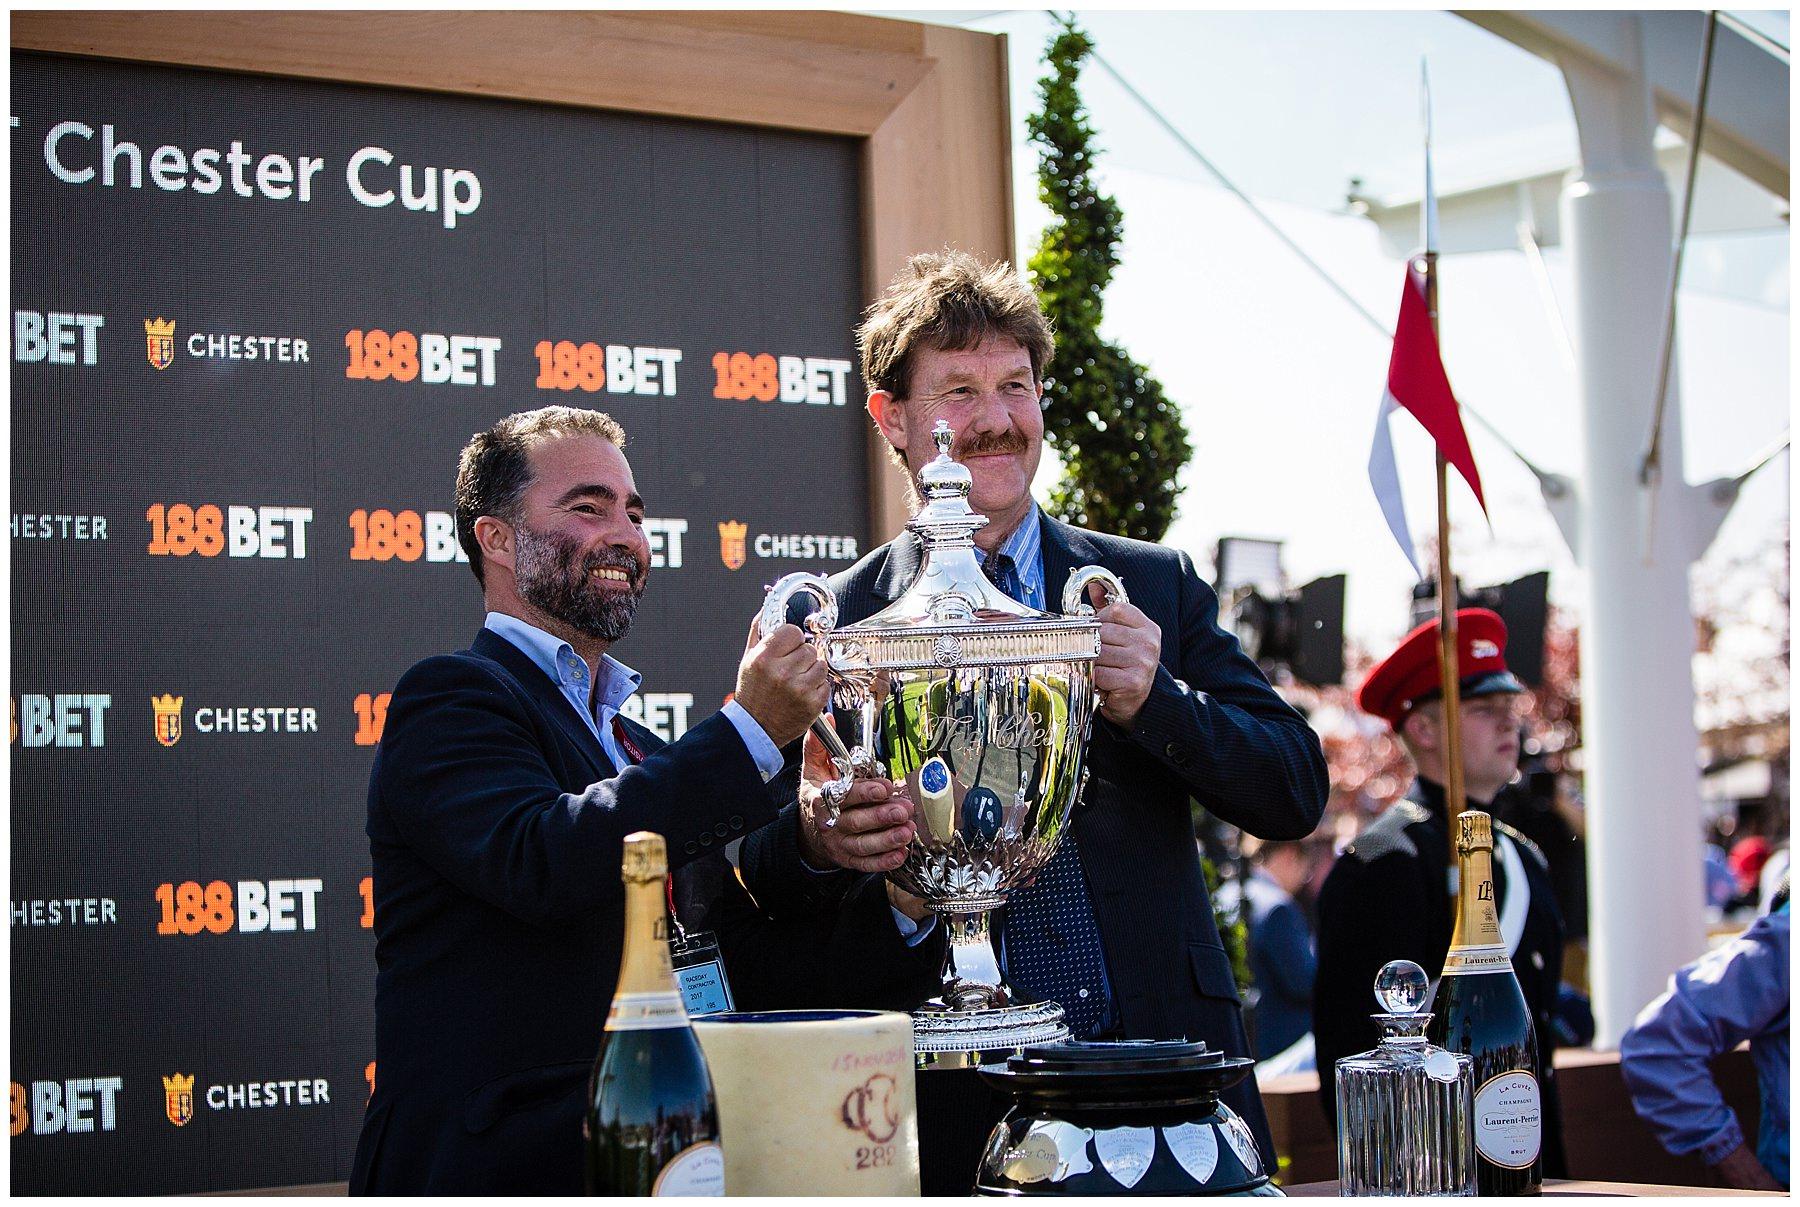 188 bet race winner - boodles may festival 2017